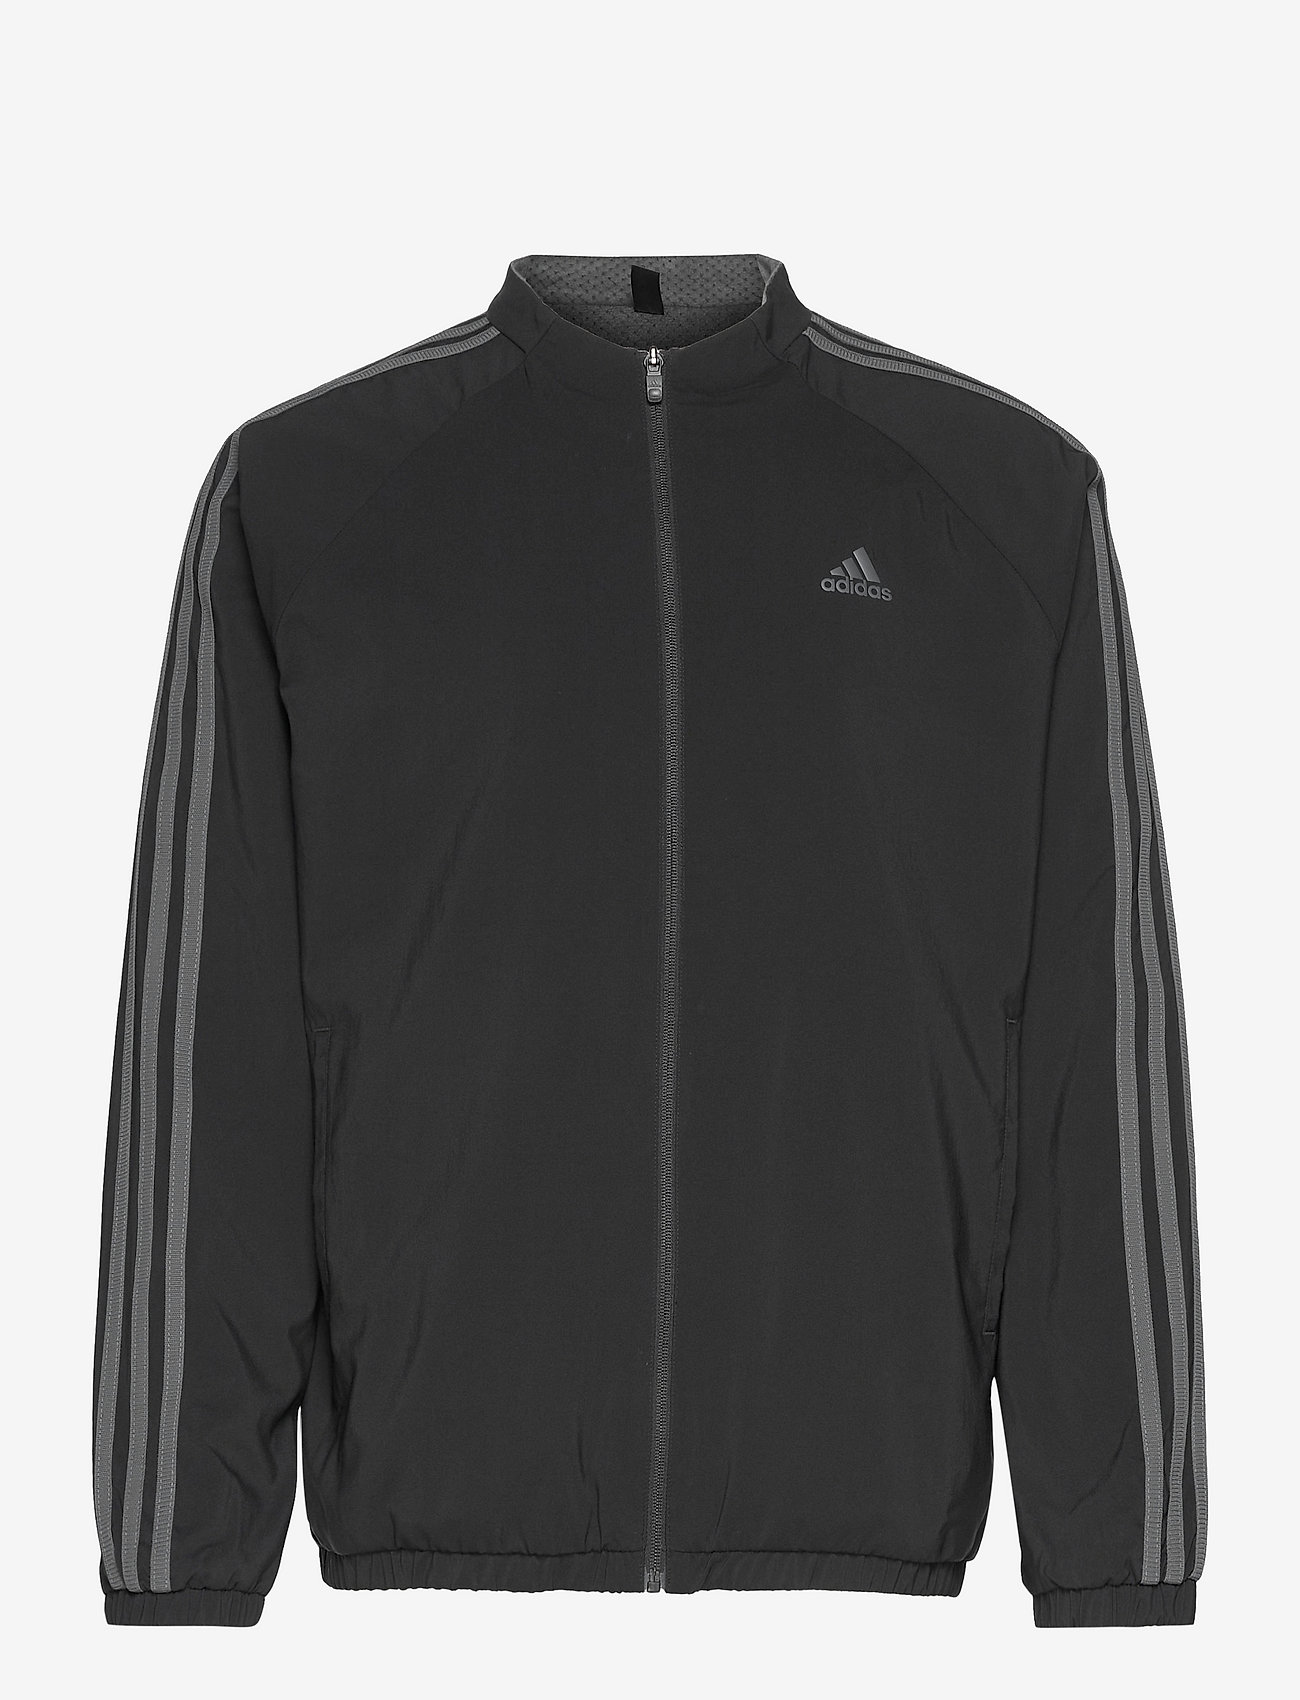 adidas Golf - LINED FZ JKT - vestes de golf - black - 1